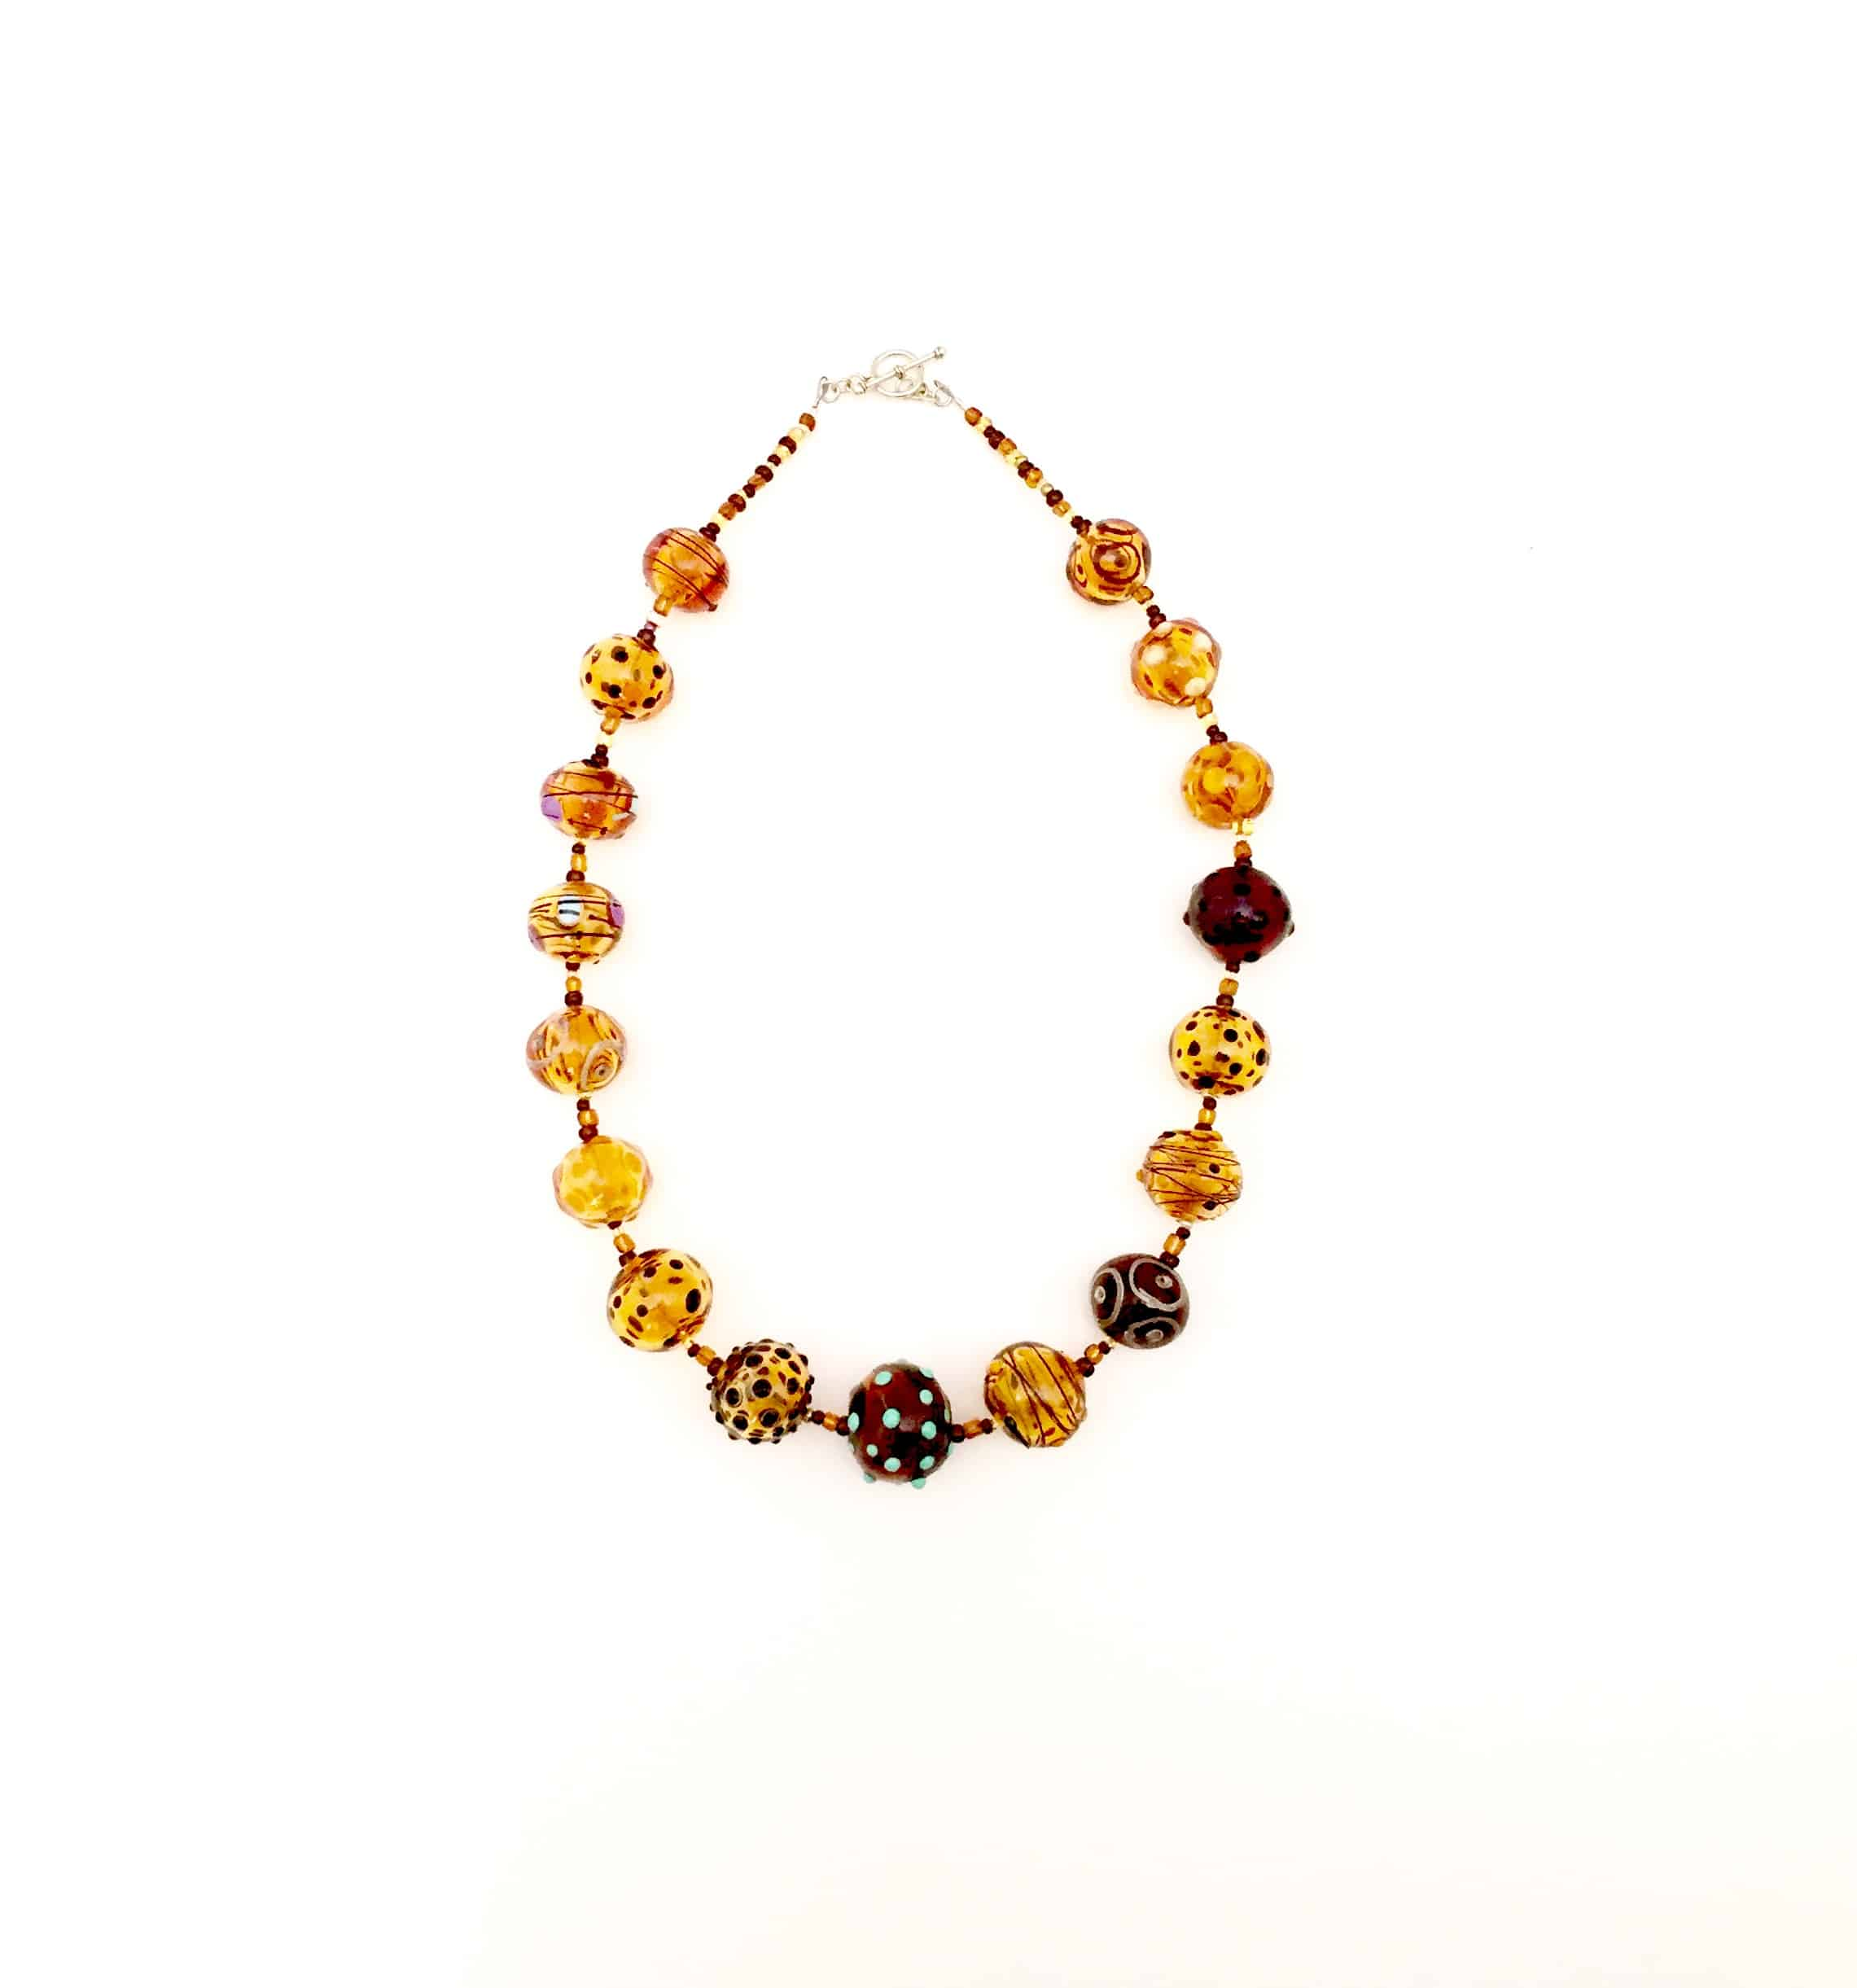 Helen Zitkevicius-amber-necklace-shiny